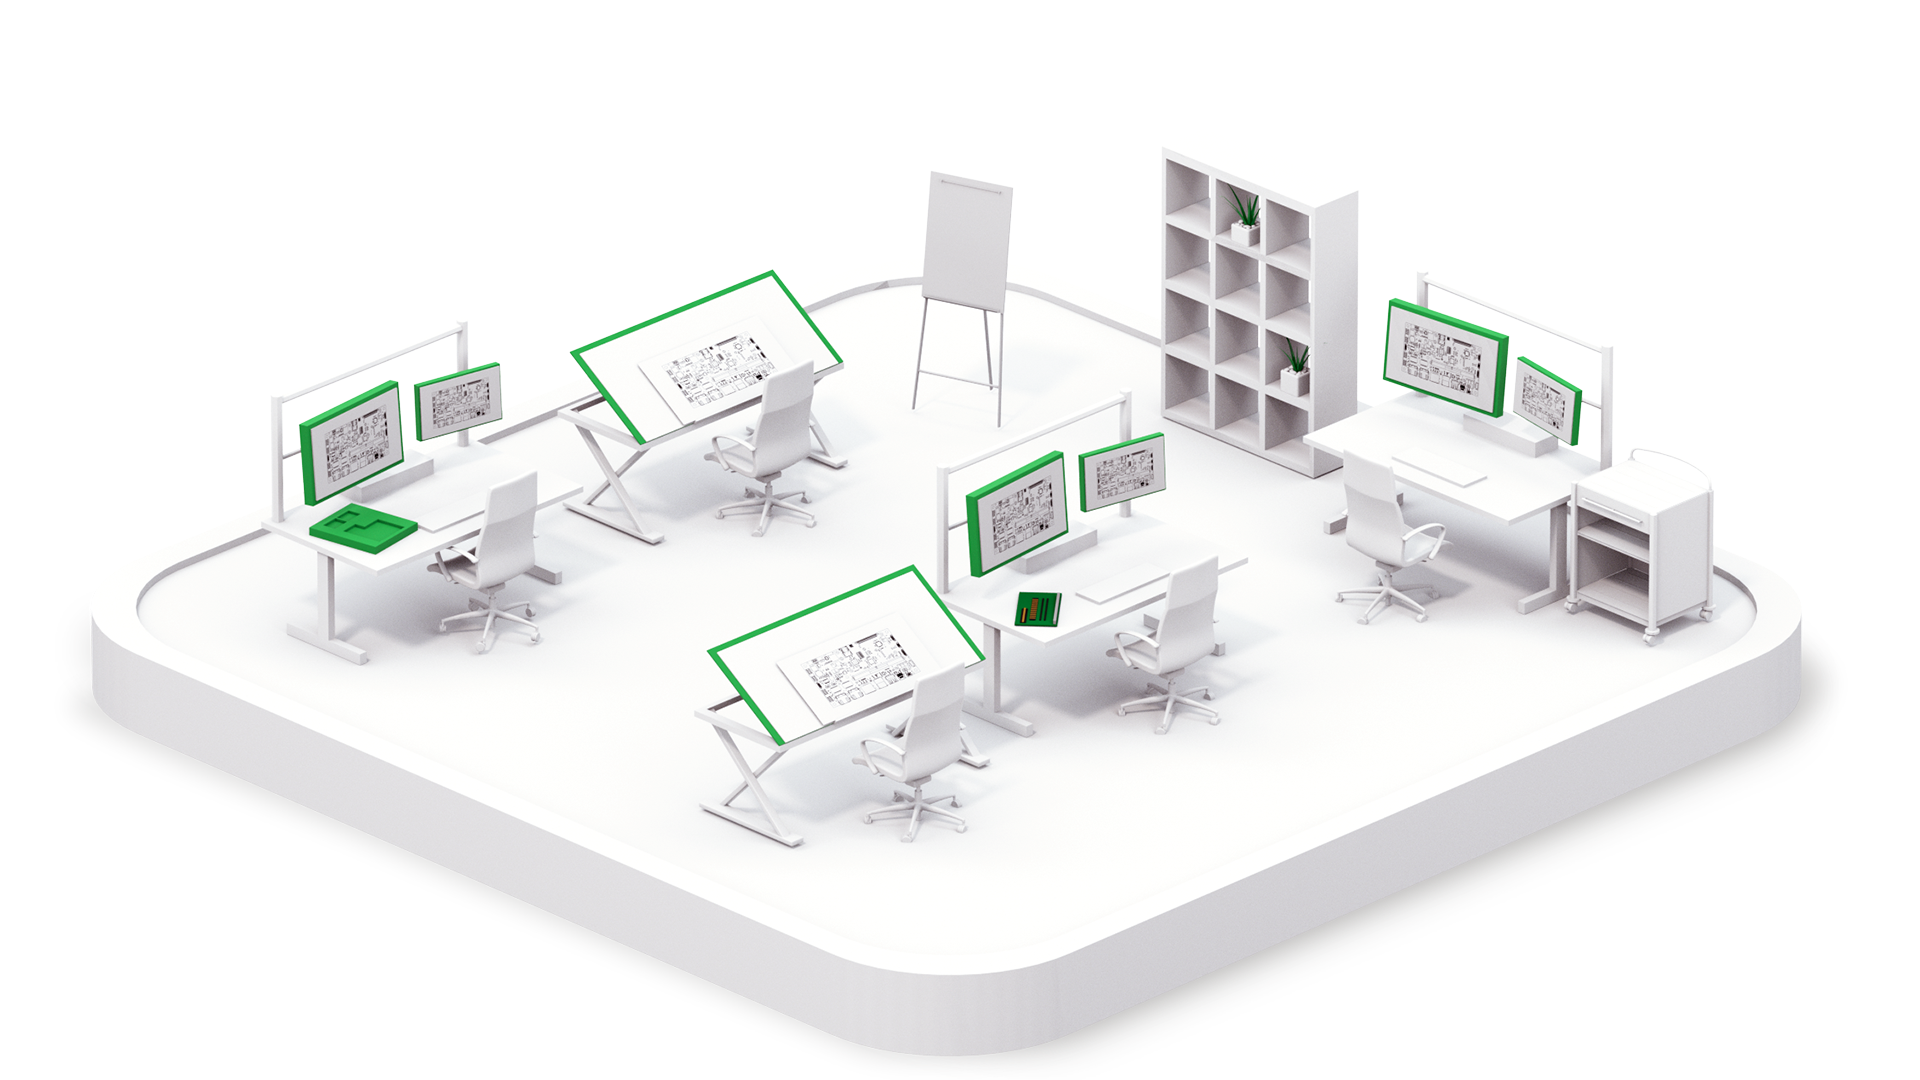 A graphic showing a compute design studio